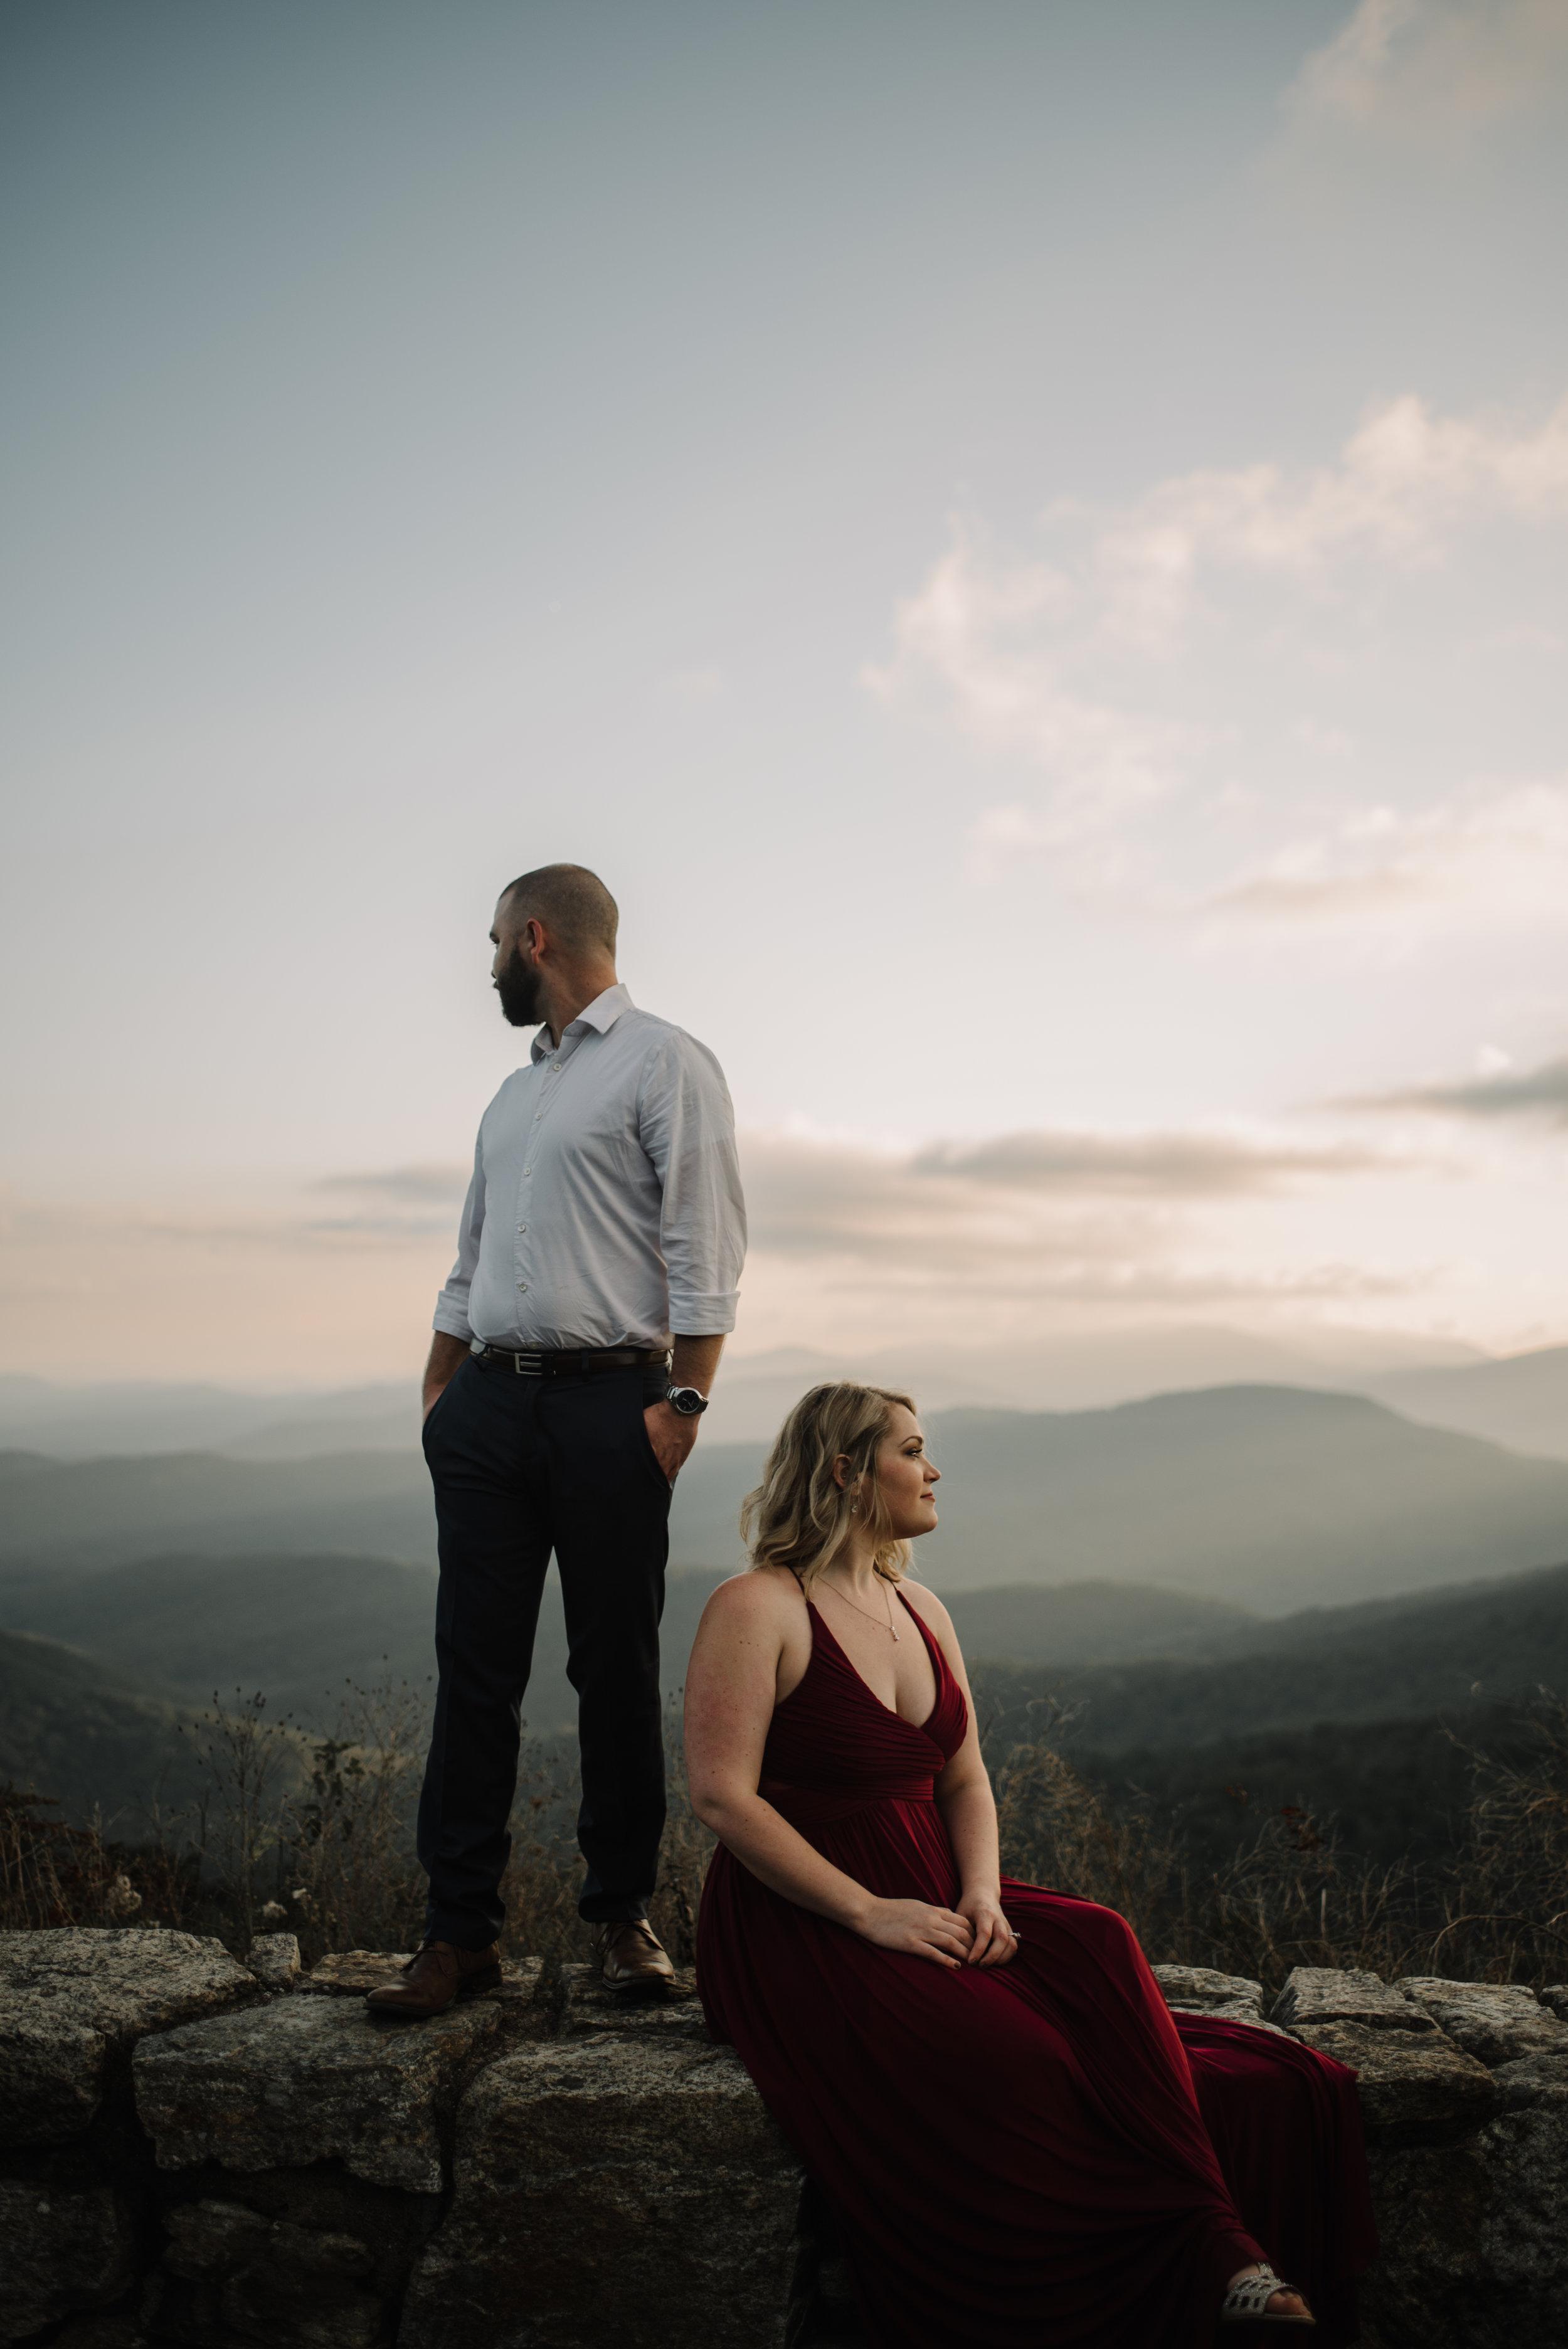 Allie & Greg - Engagement Session - Shenandoah National Park - White Sails Creative_82.JPG